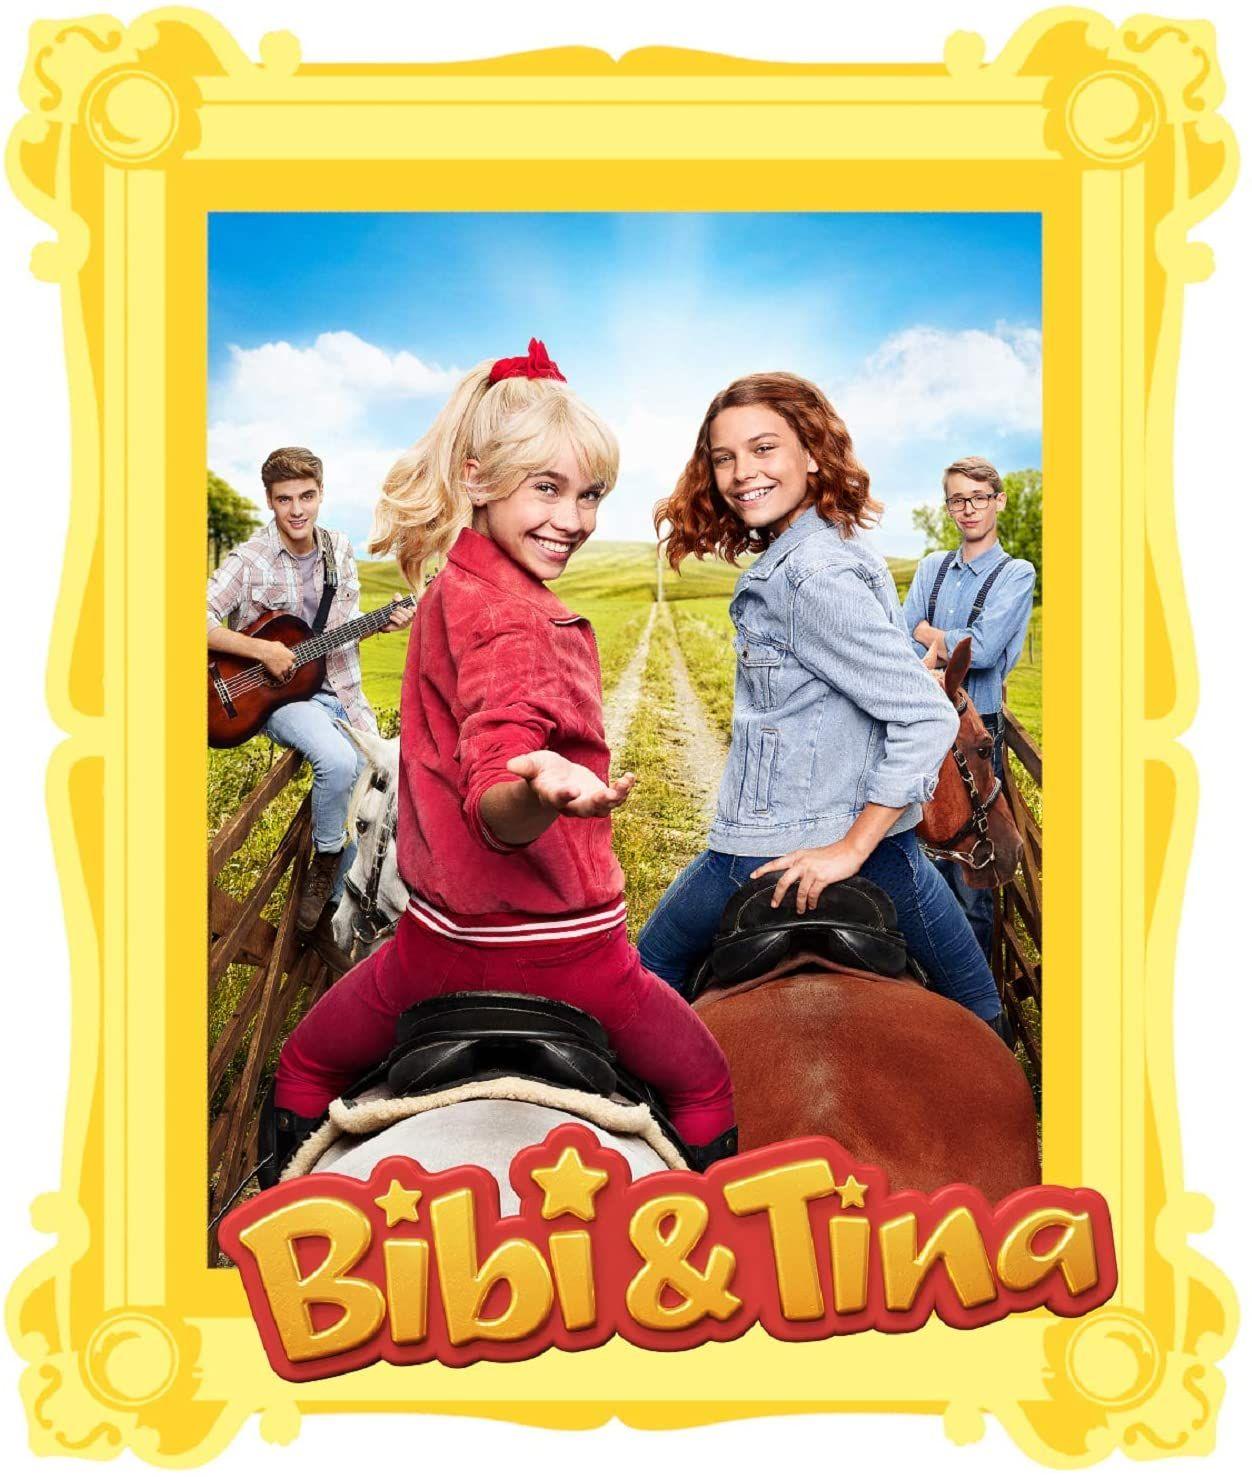 Bibi Tina Serie Wandtattoos Mit Bibi Tina Pferden Bibi Und Tina Kinder Wandtattoo